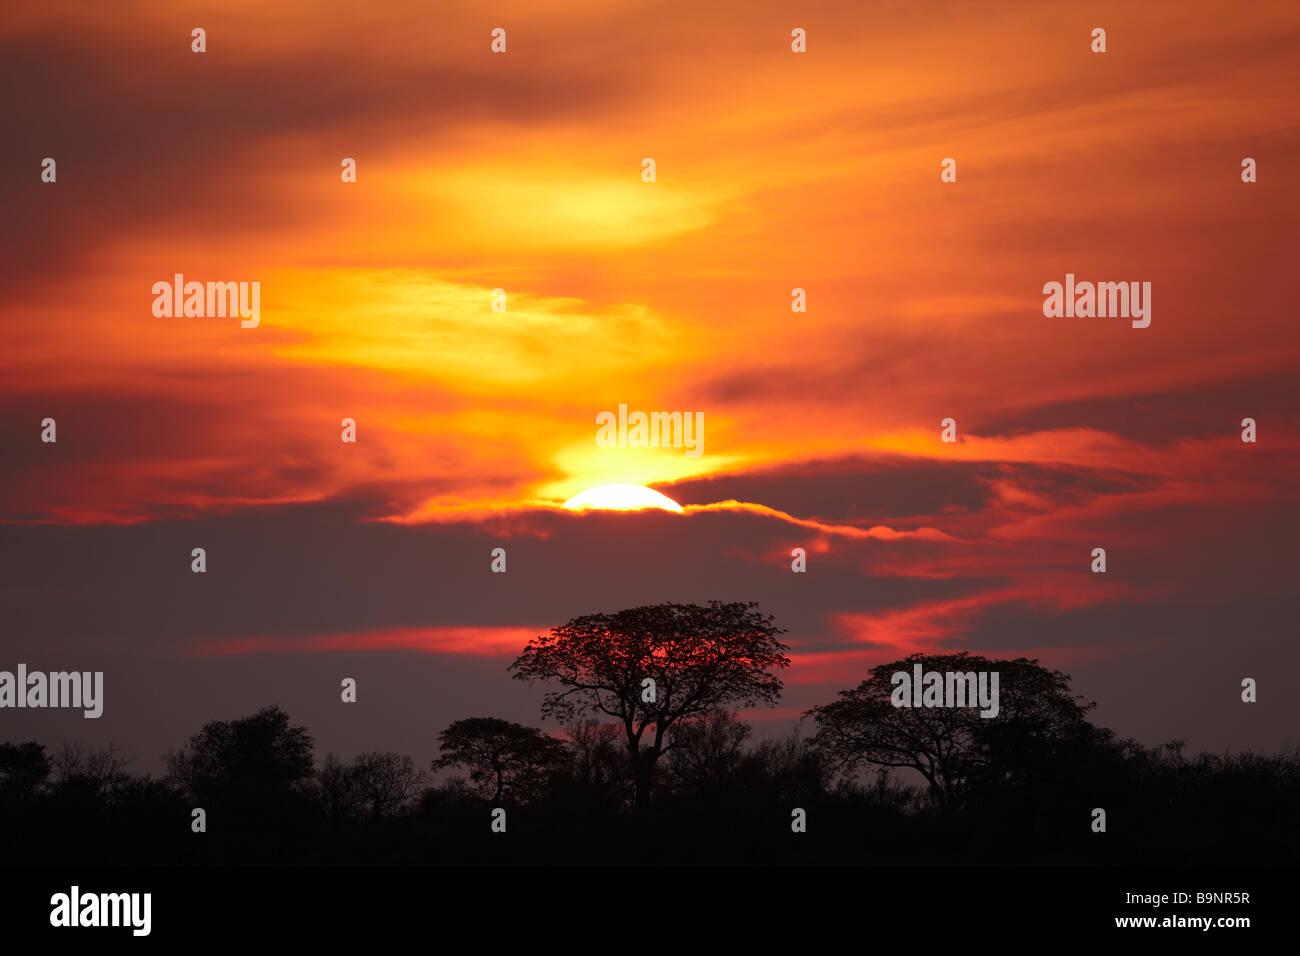 Silhouette der Mopane Bäume bei Sonnenuntergang, Krüger Nationalpark, Südafrika Stockbild